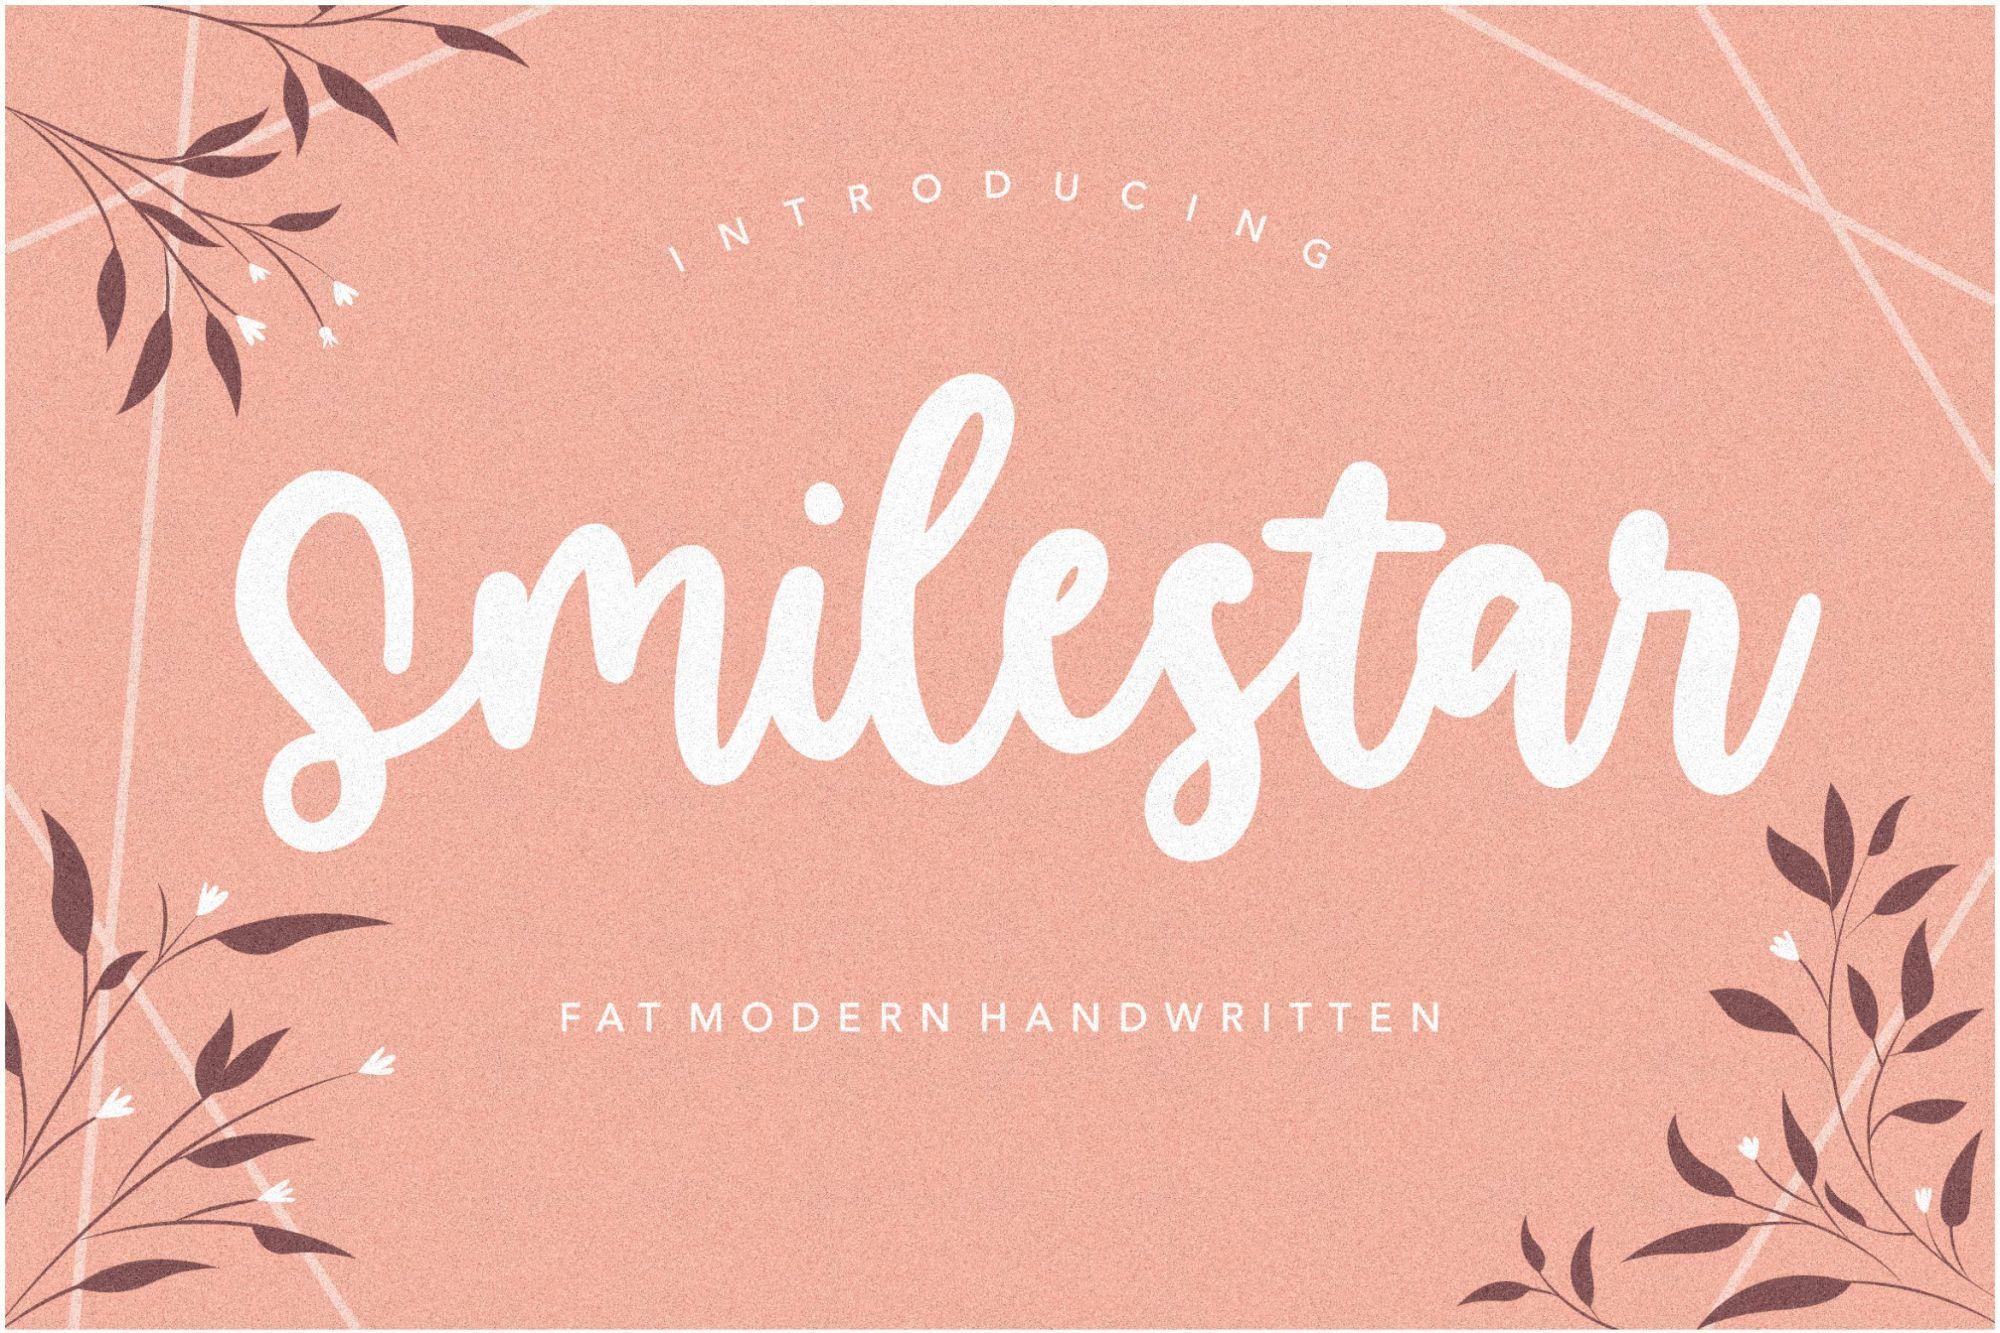 Smilestar-Bold-Handwritten-Font-1